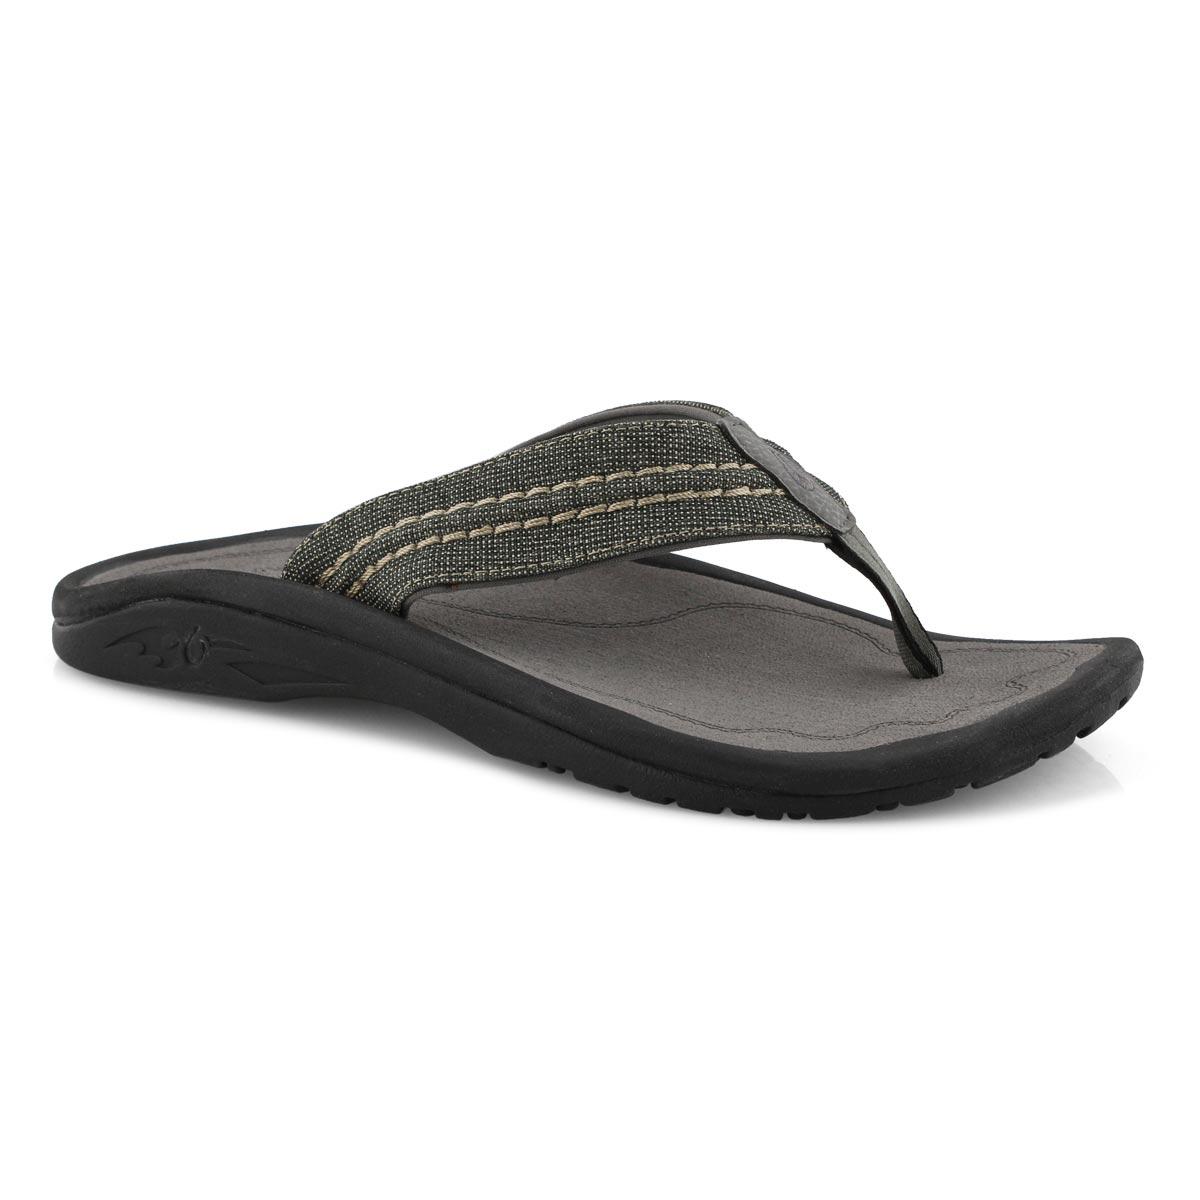 Mns Hokua Mesh clay thong sandal